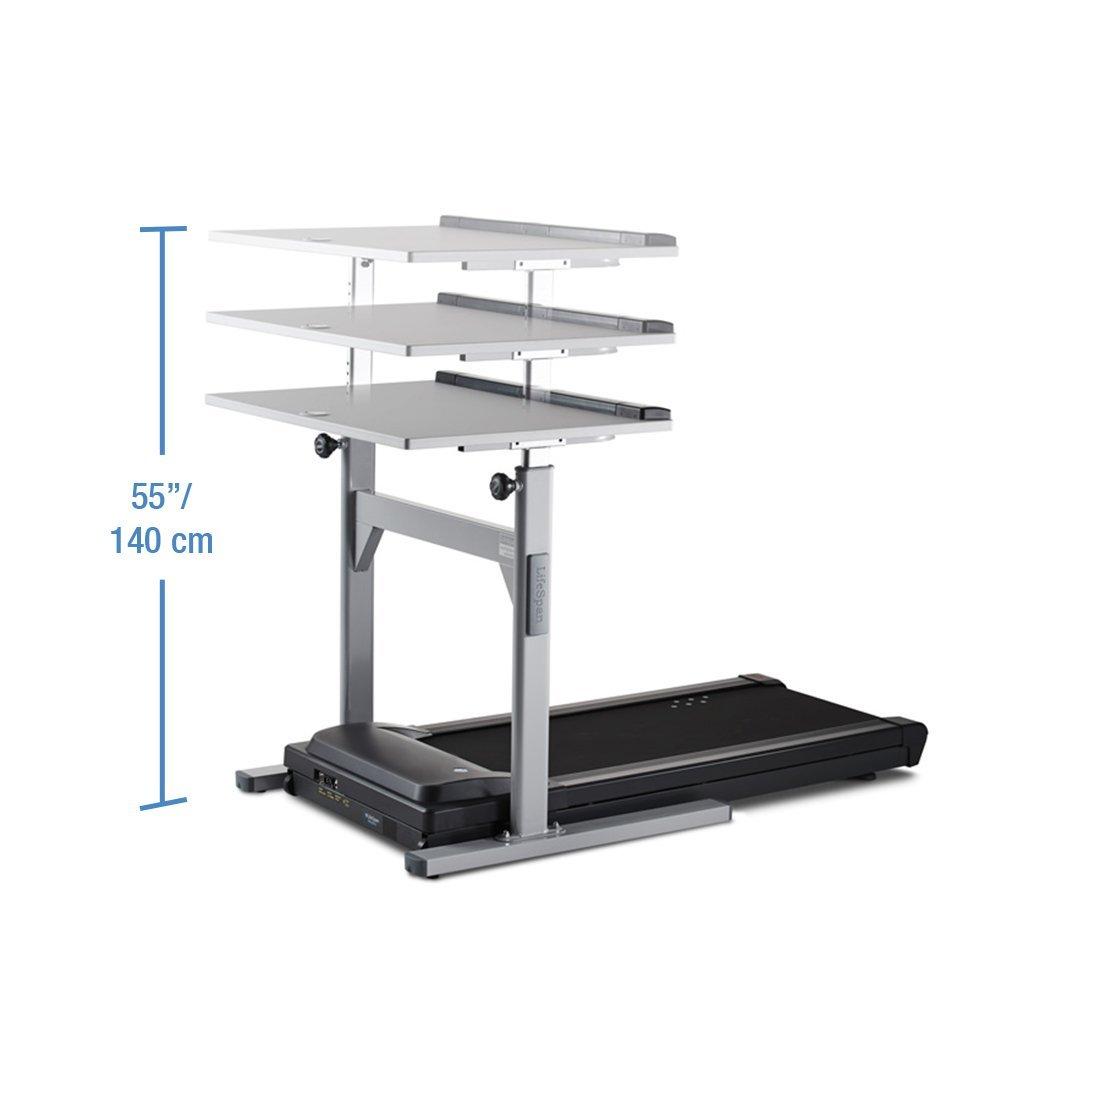 LifeSpan TR1200DT5 Treadmill Desk NotSittingcom